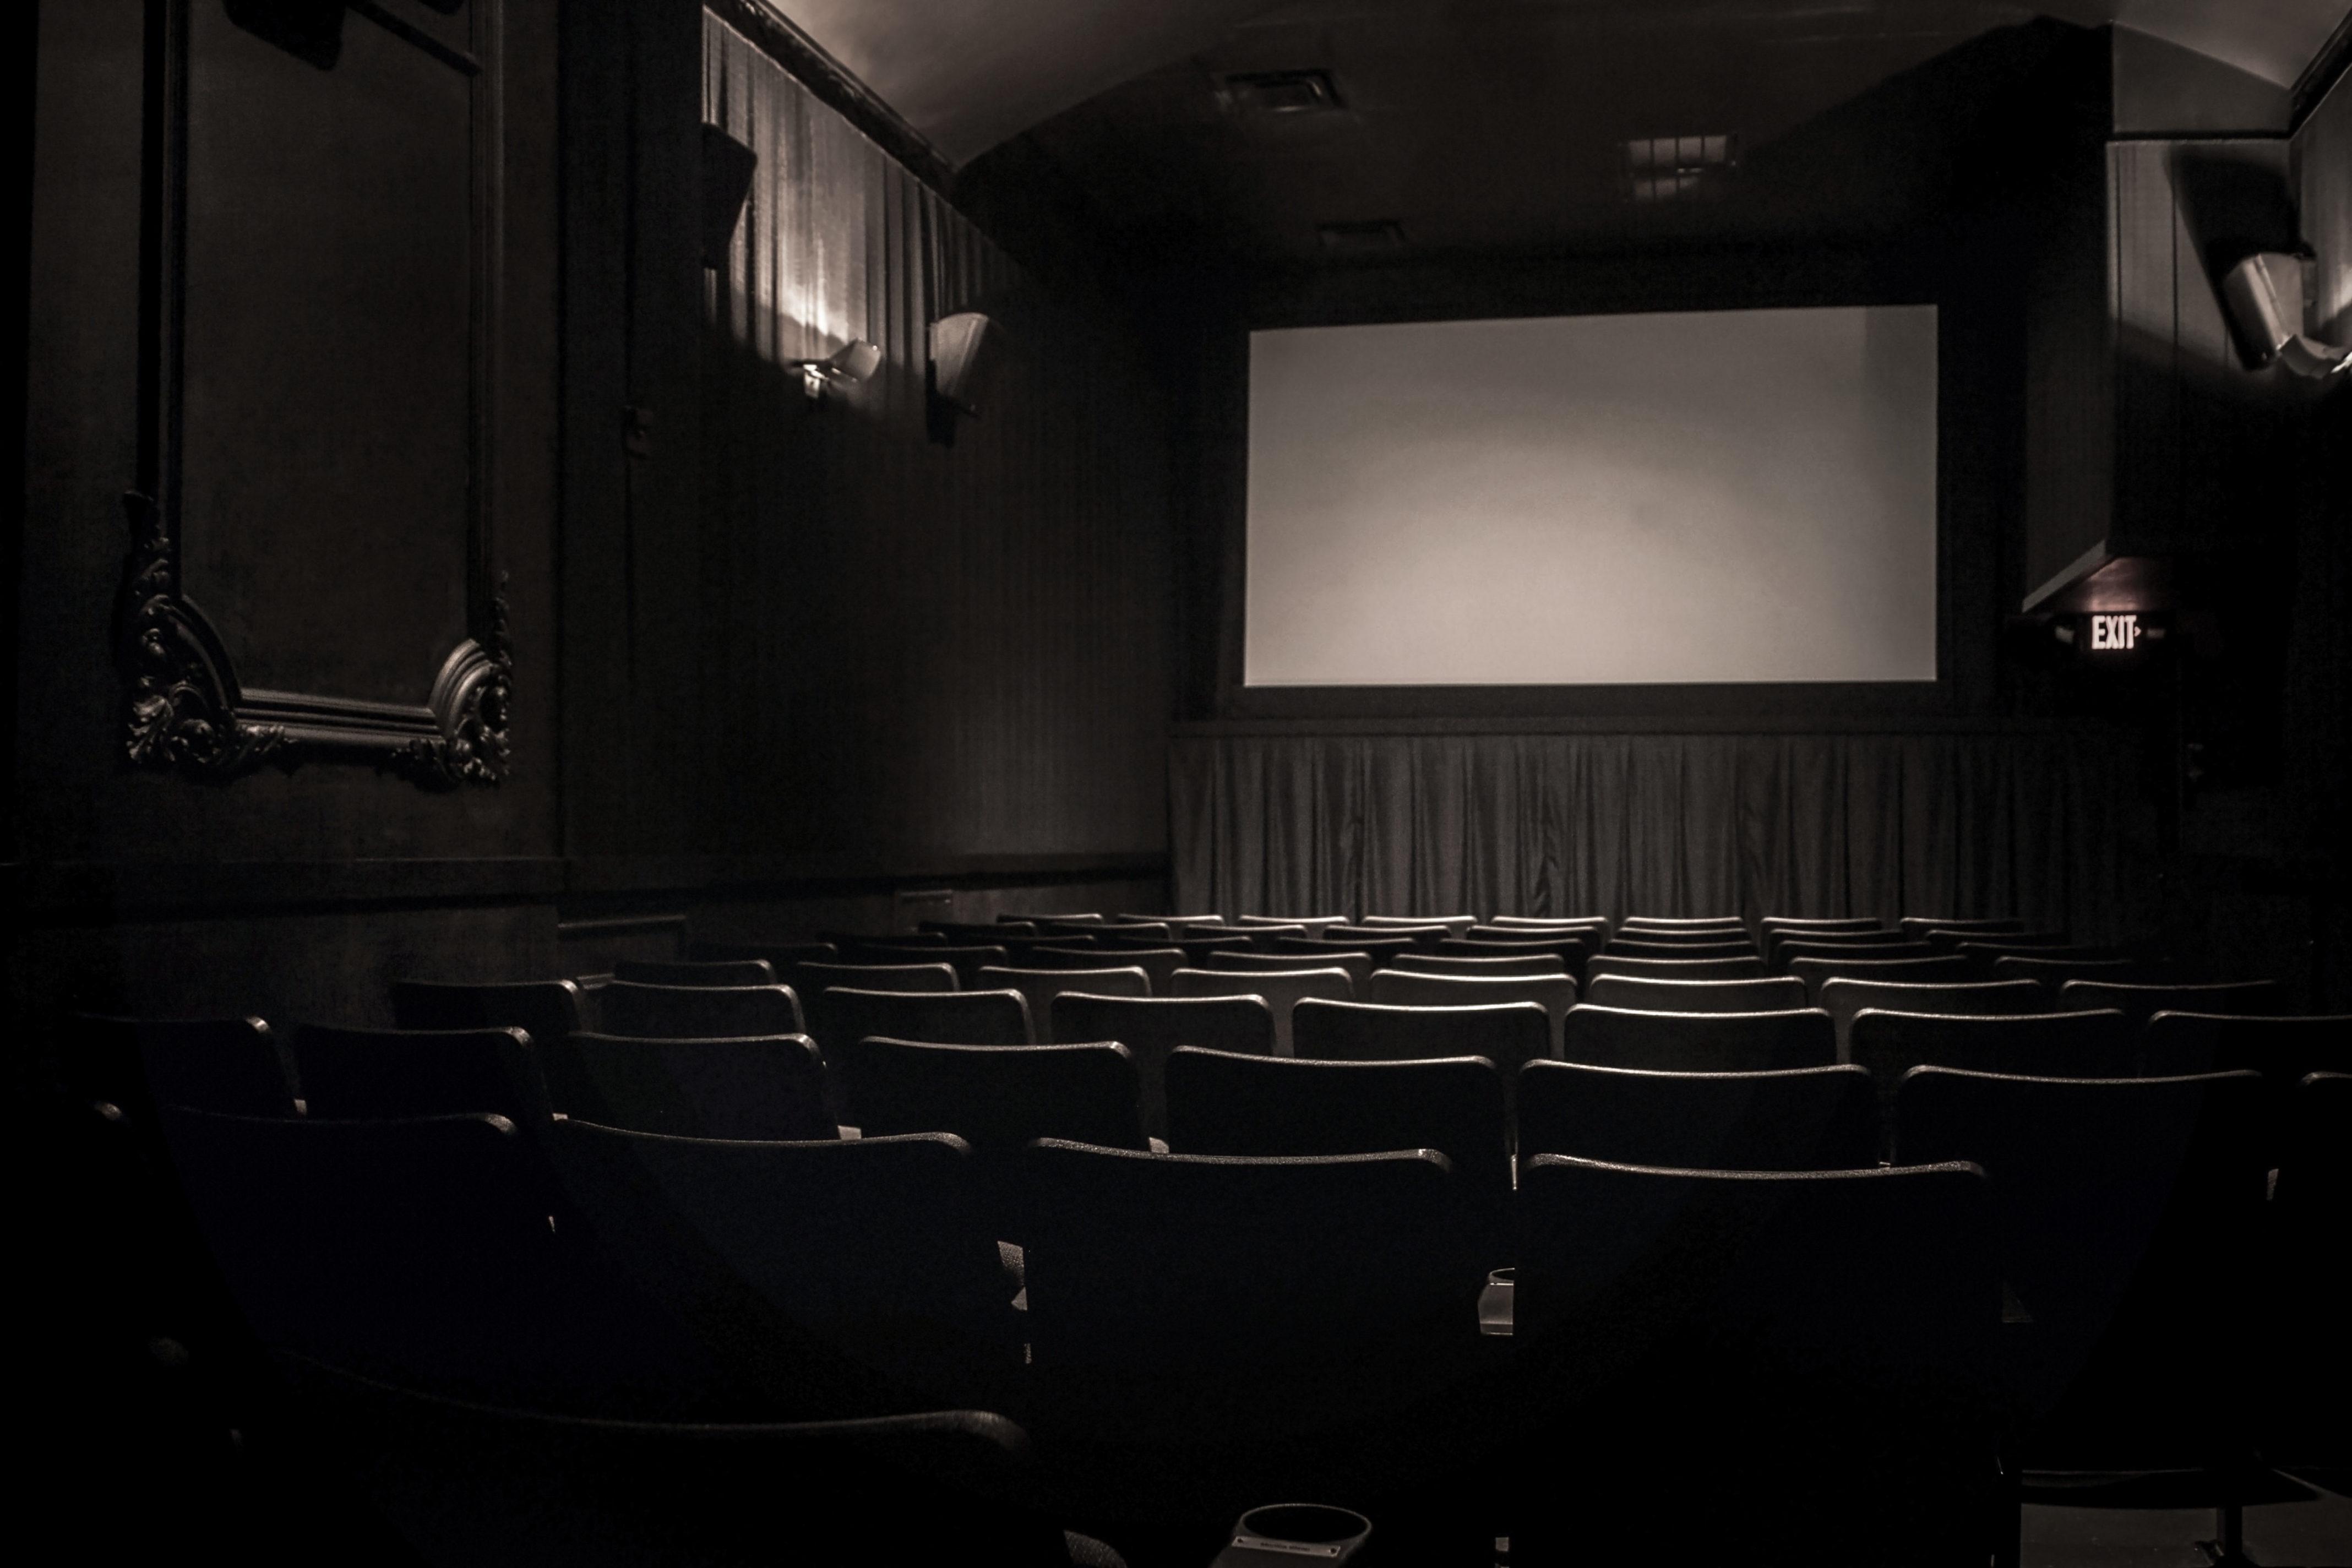 inside of aperture cinema